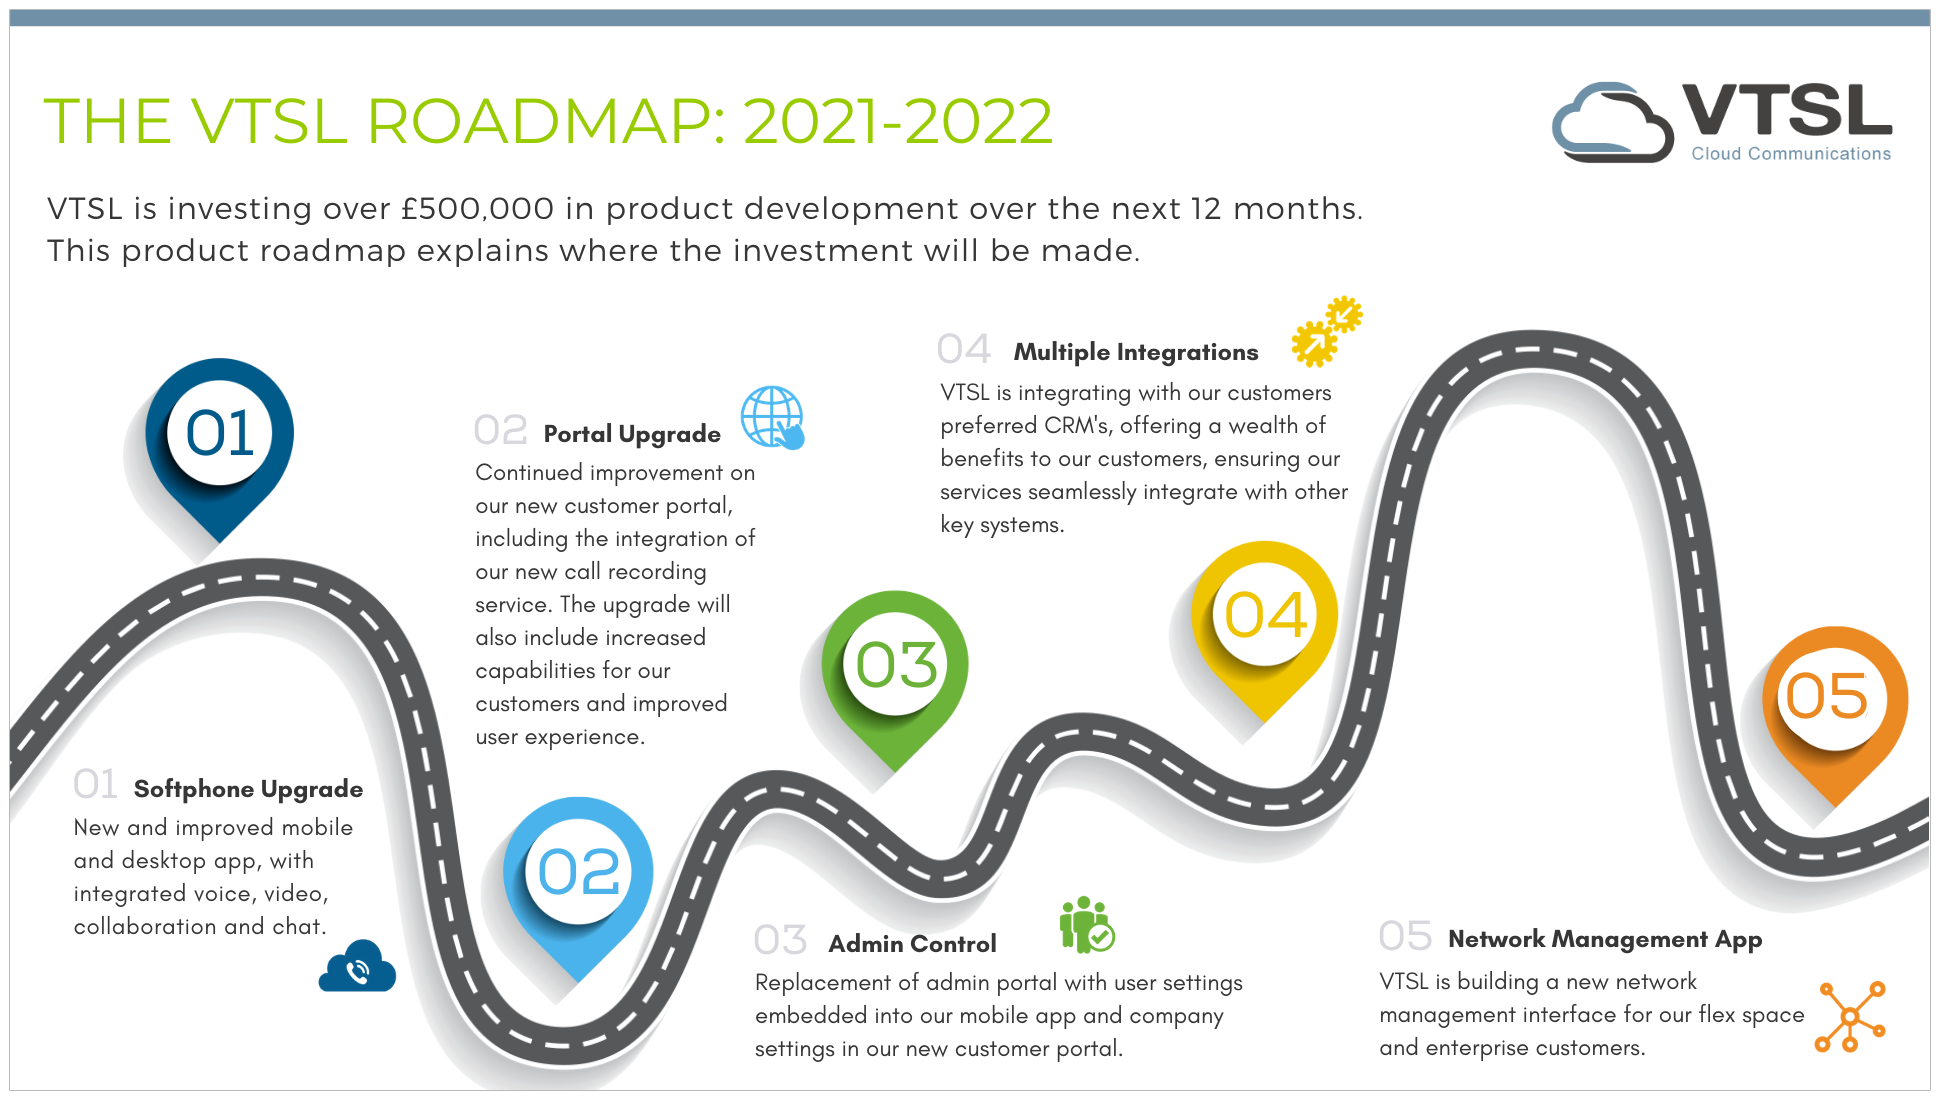 THE VTSL ROADMAP 2021-2022 (2)-1